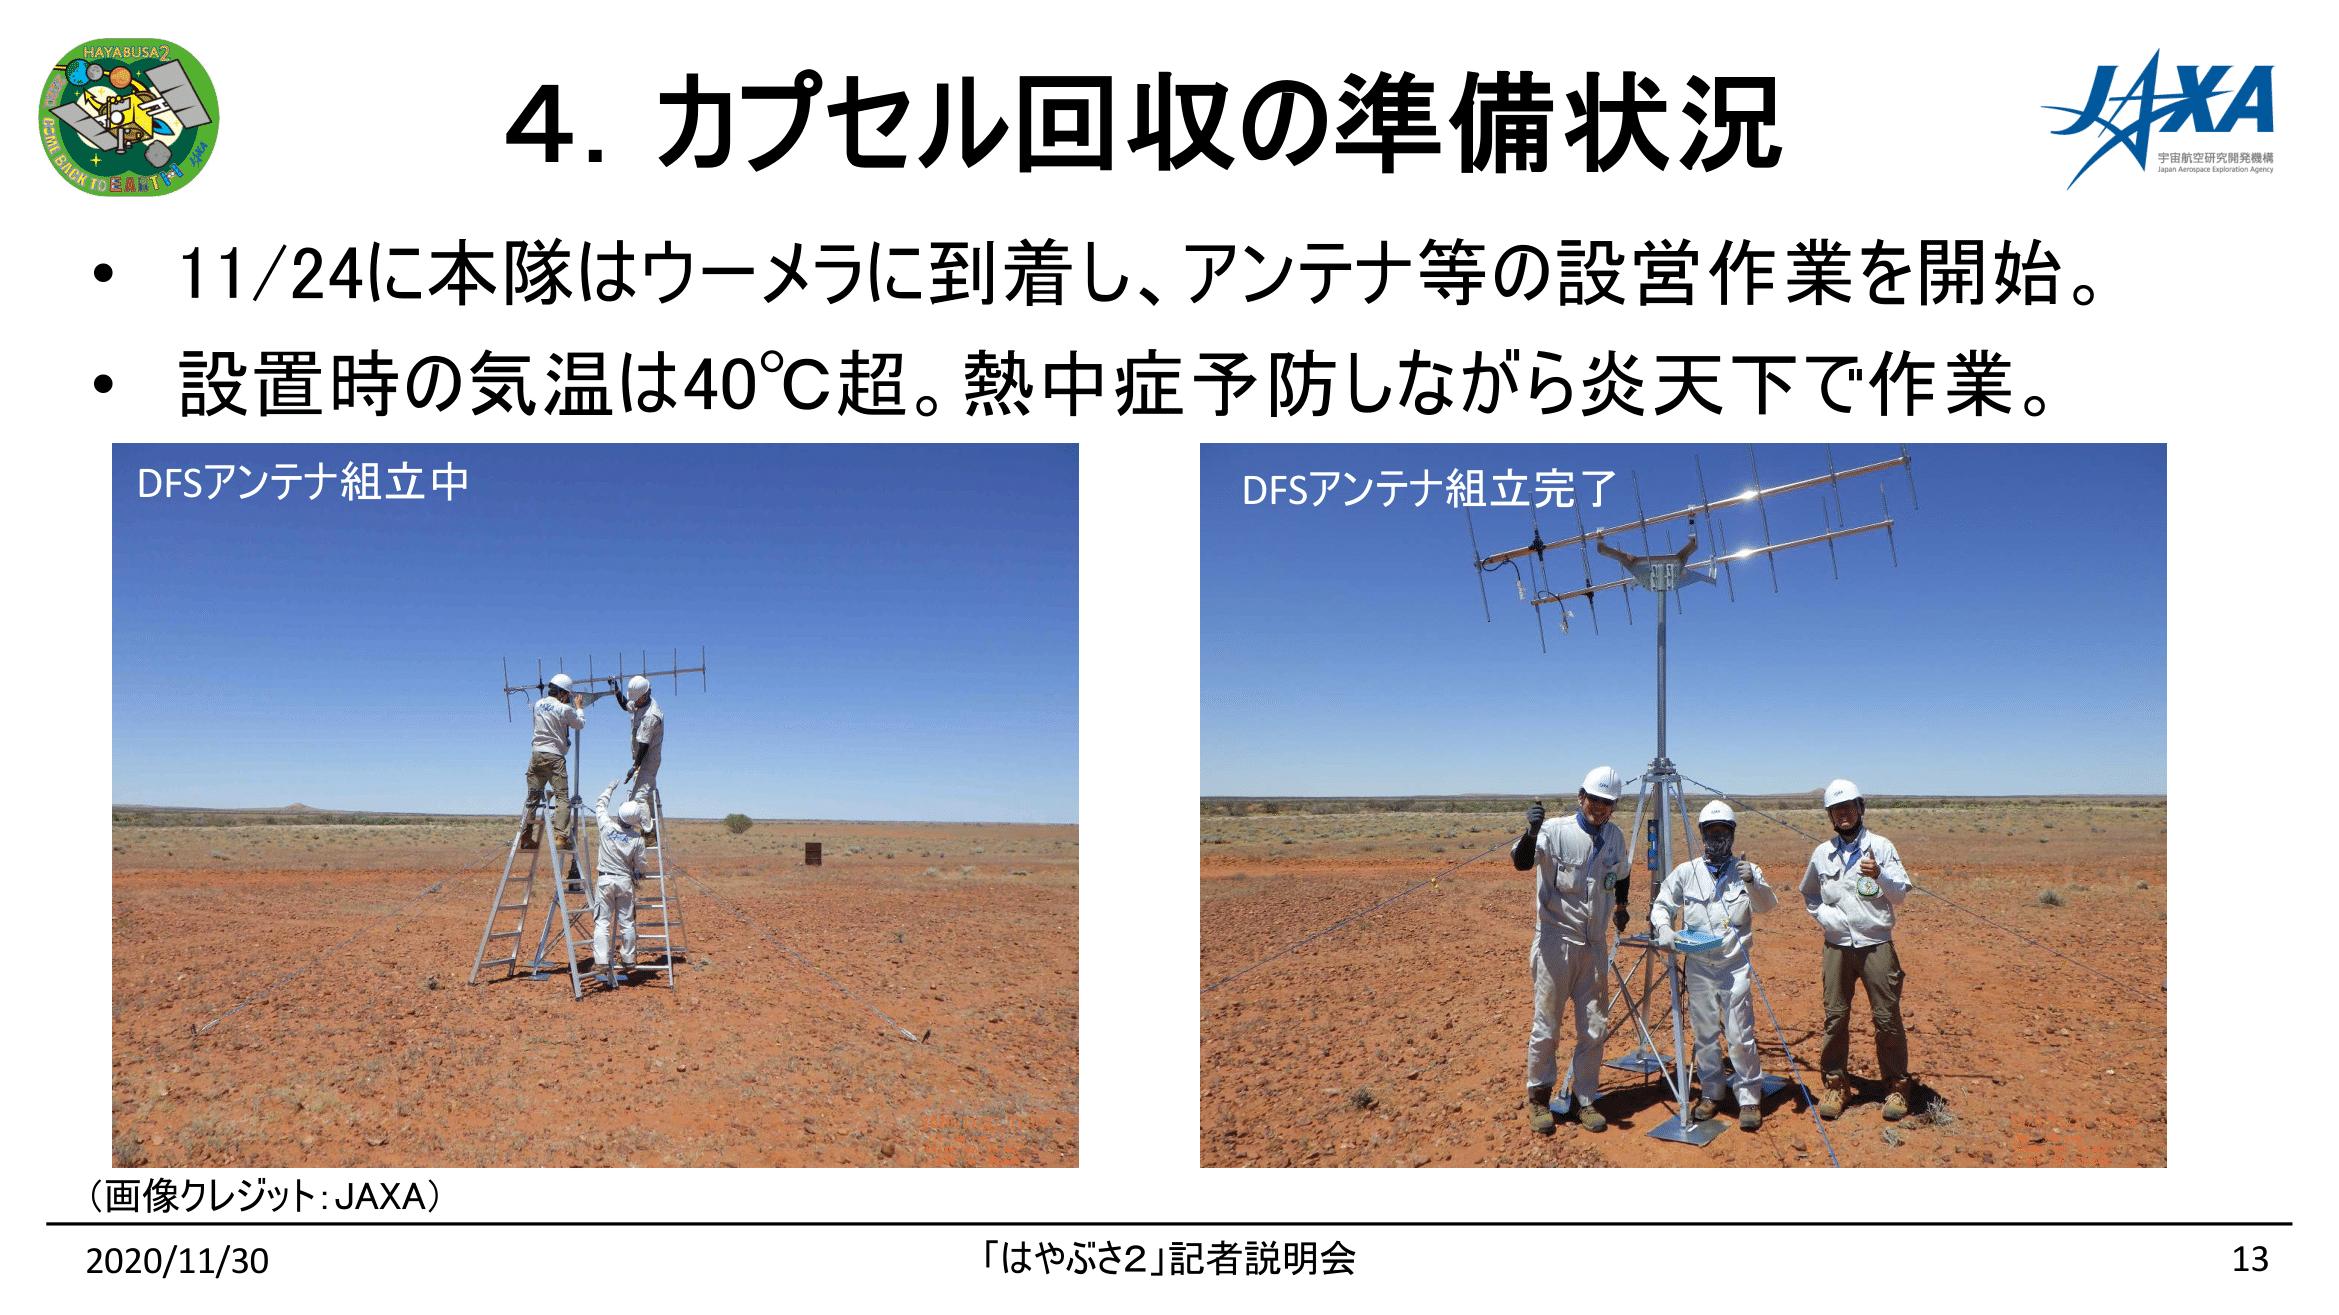 f:id:Imamura:20201130154127p:plain